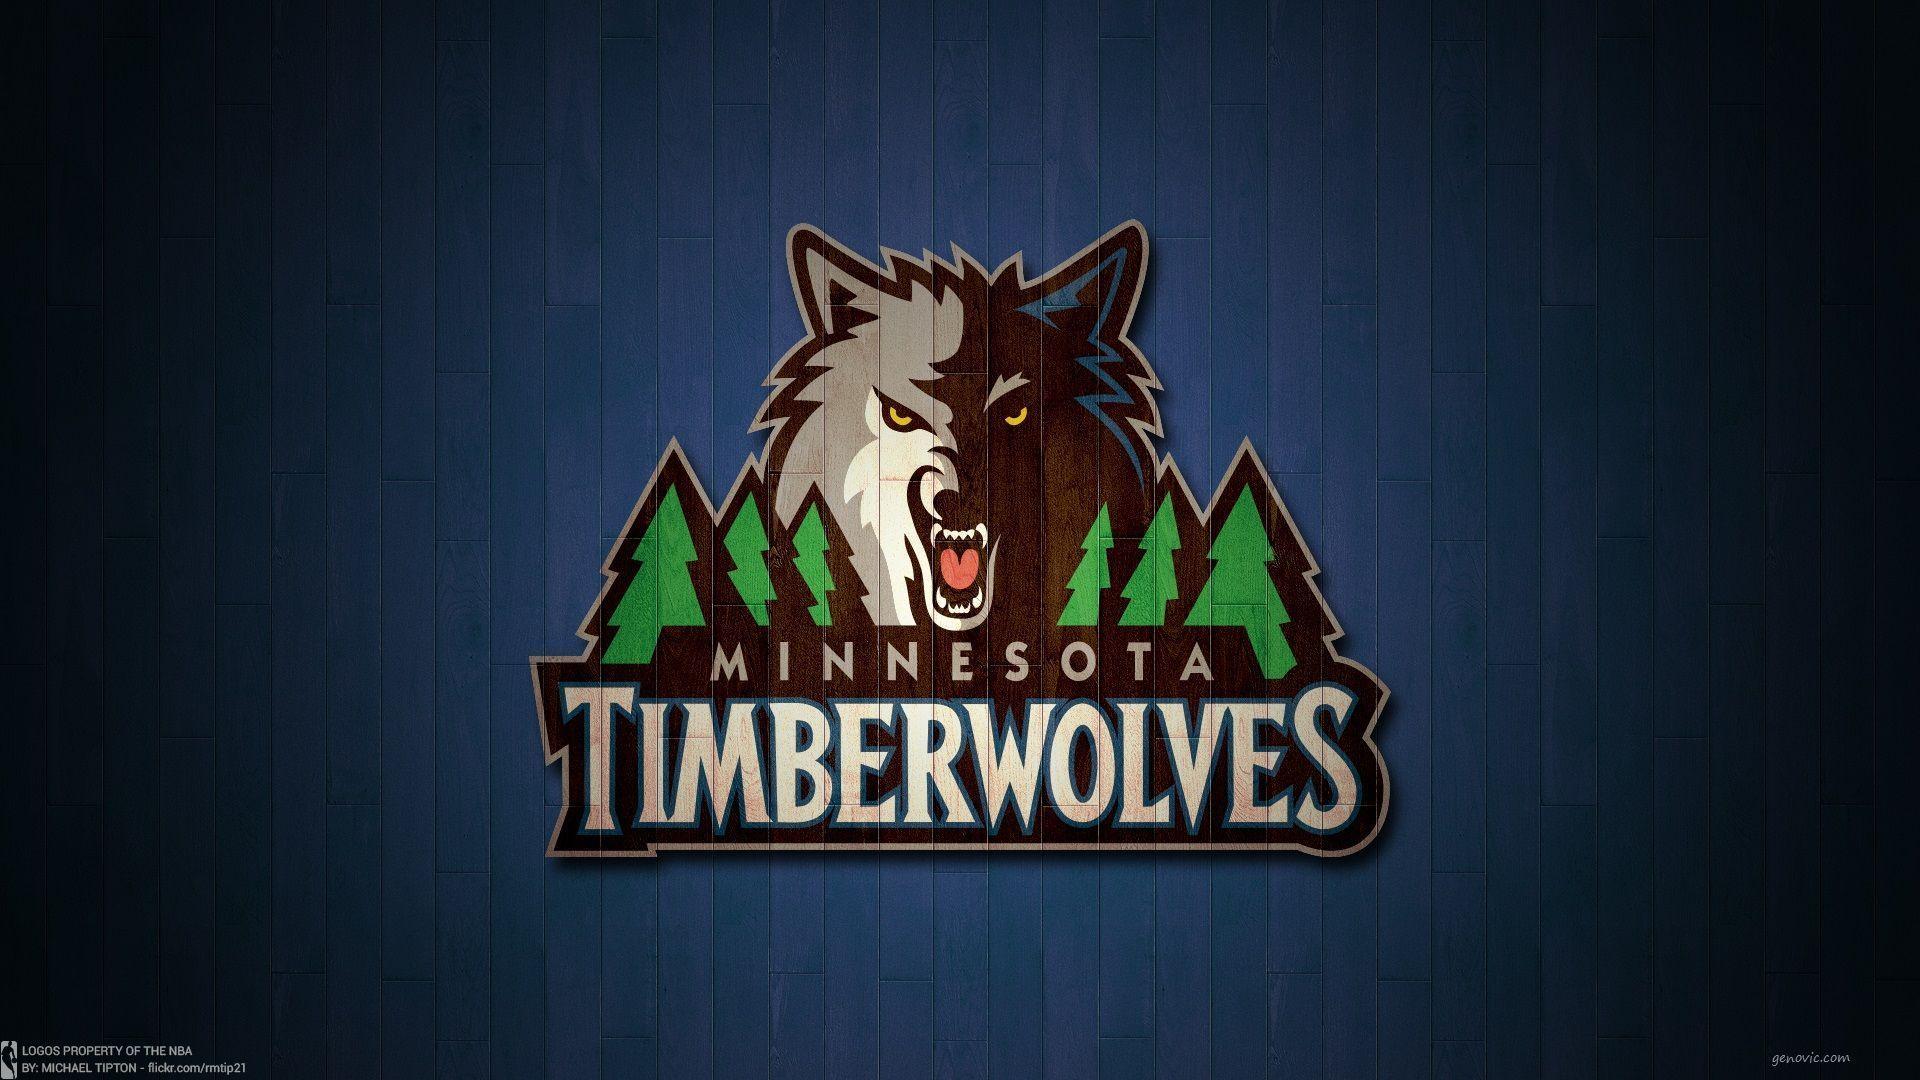 Minnesota Timberwolves picture image